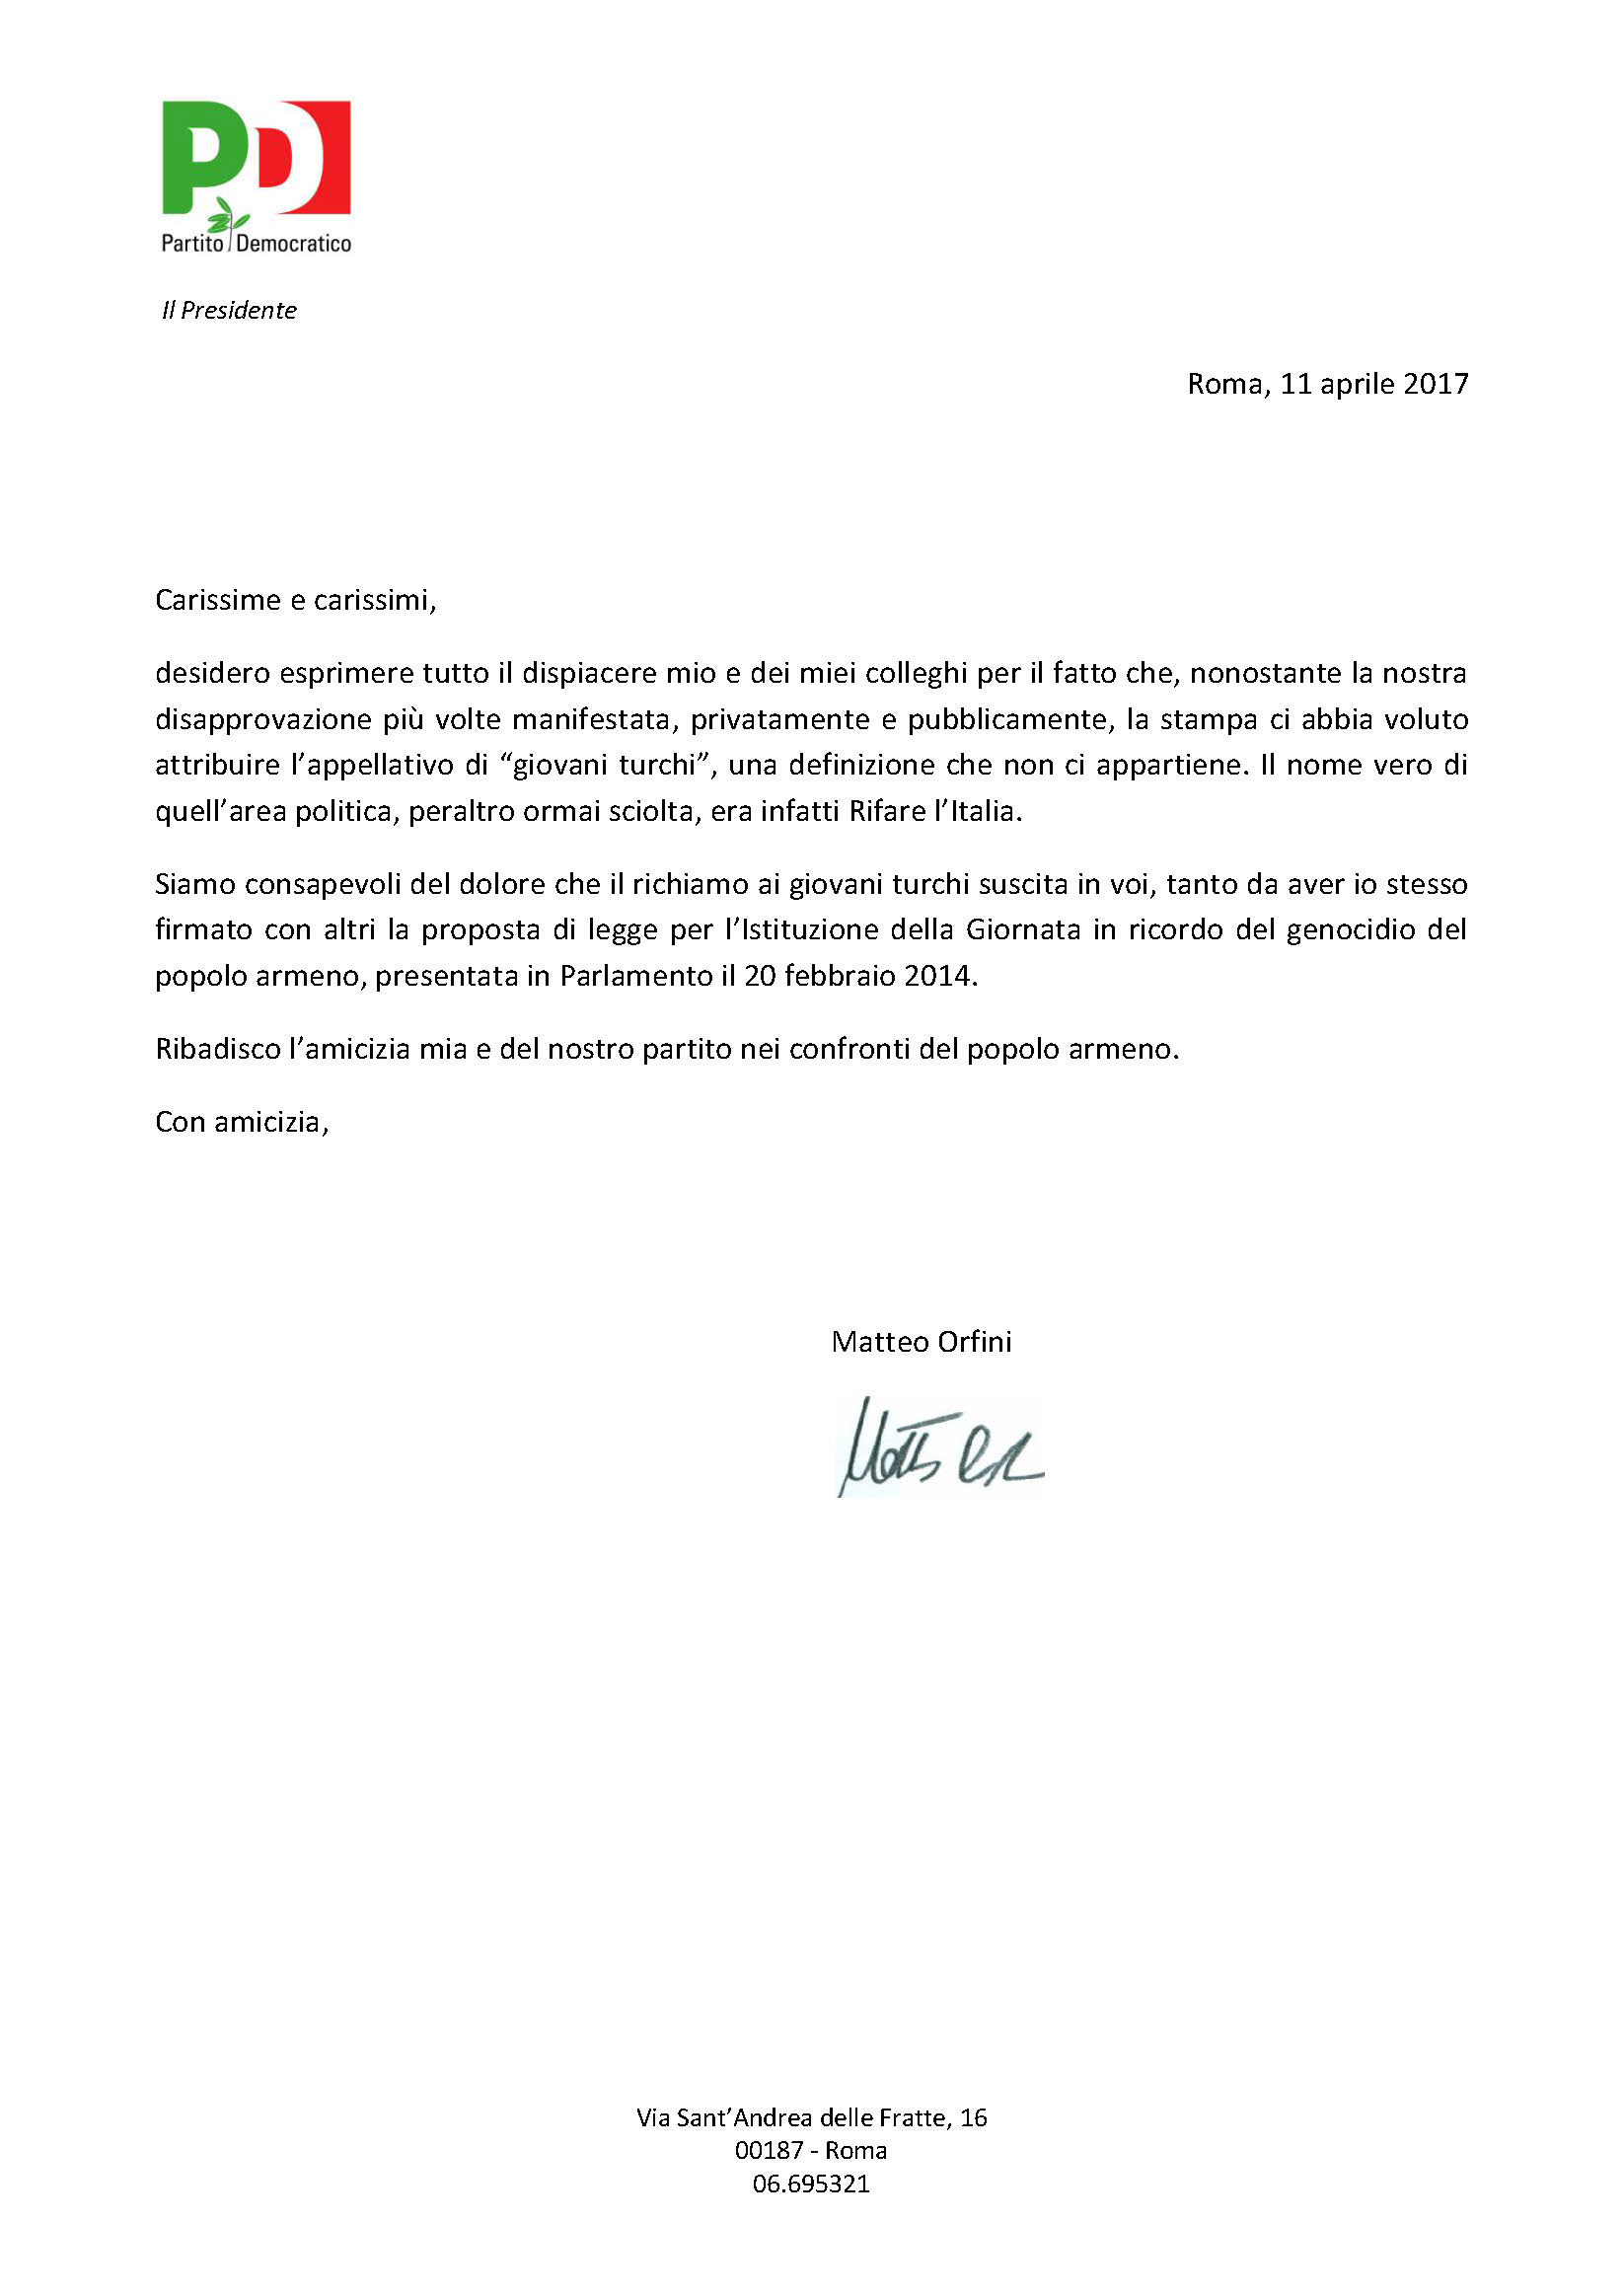 lettera-matteo-orfini